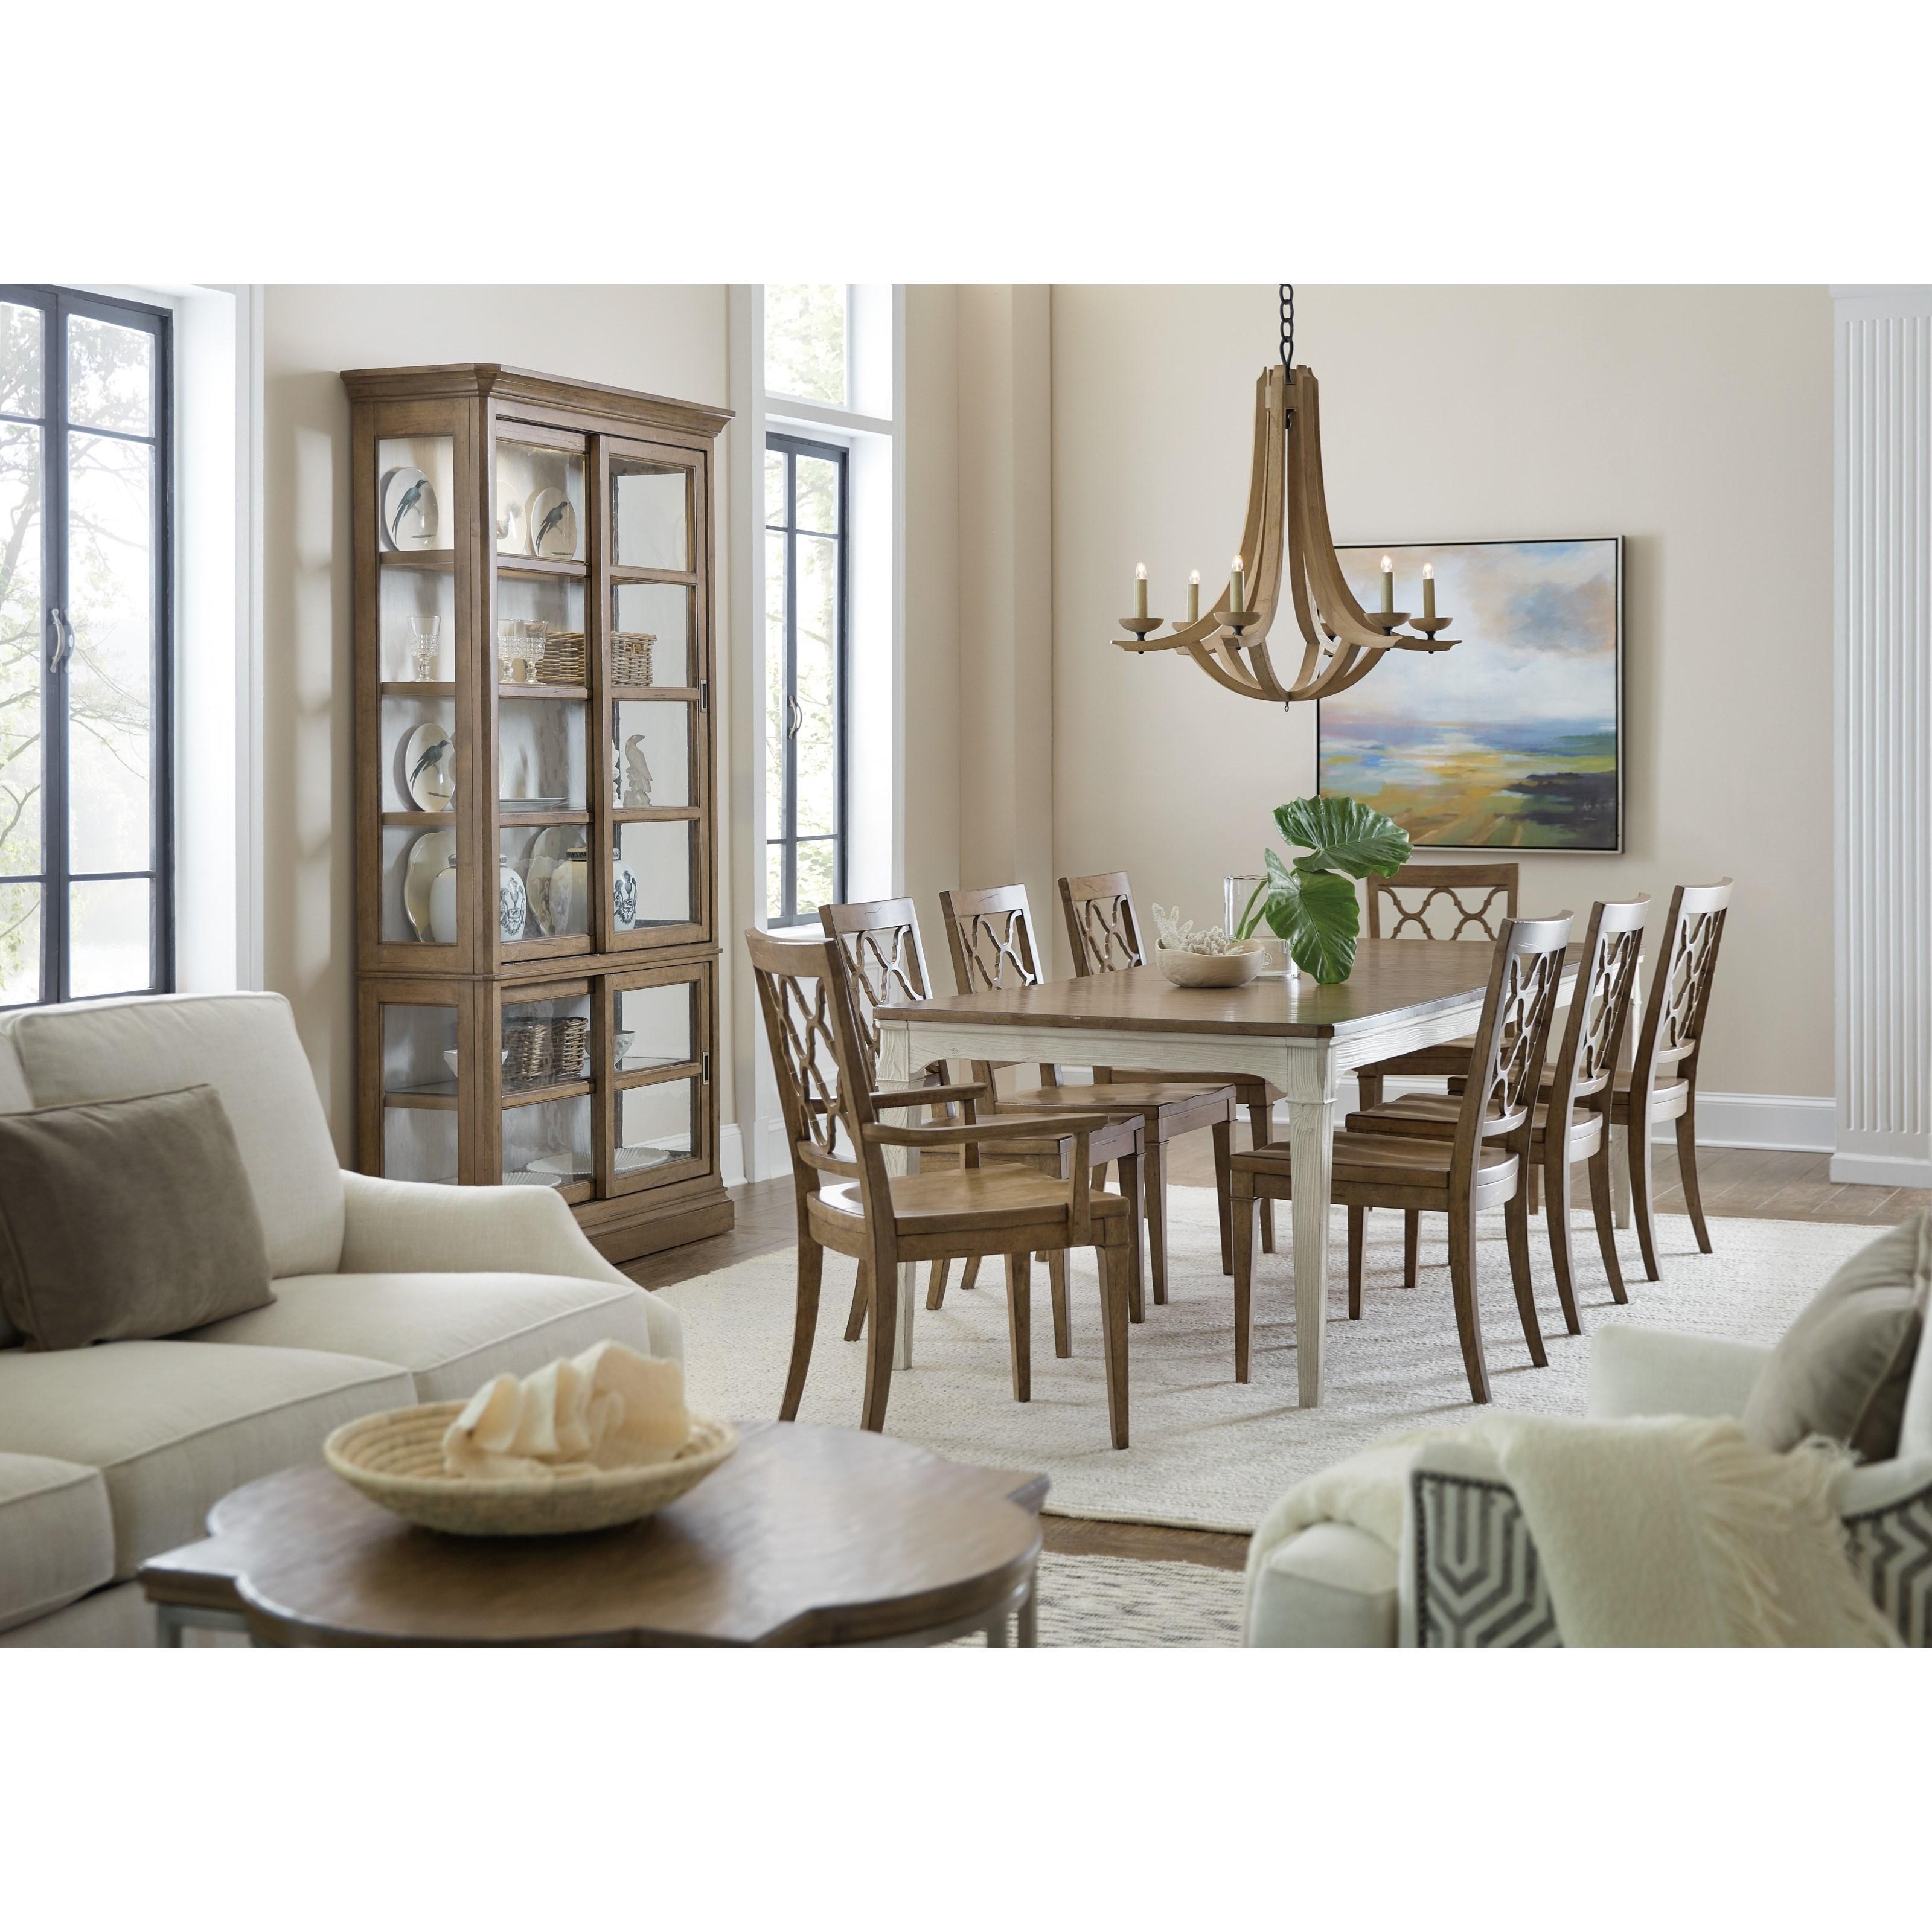 Montebello Formal Dining Room Group by Hooker Furniture at Baer's Furniture